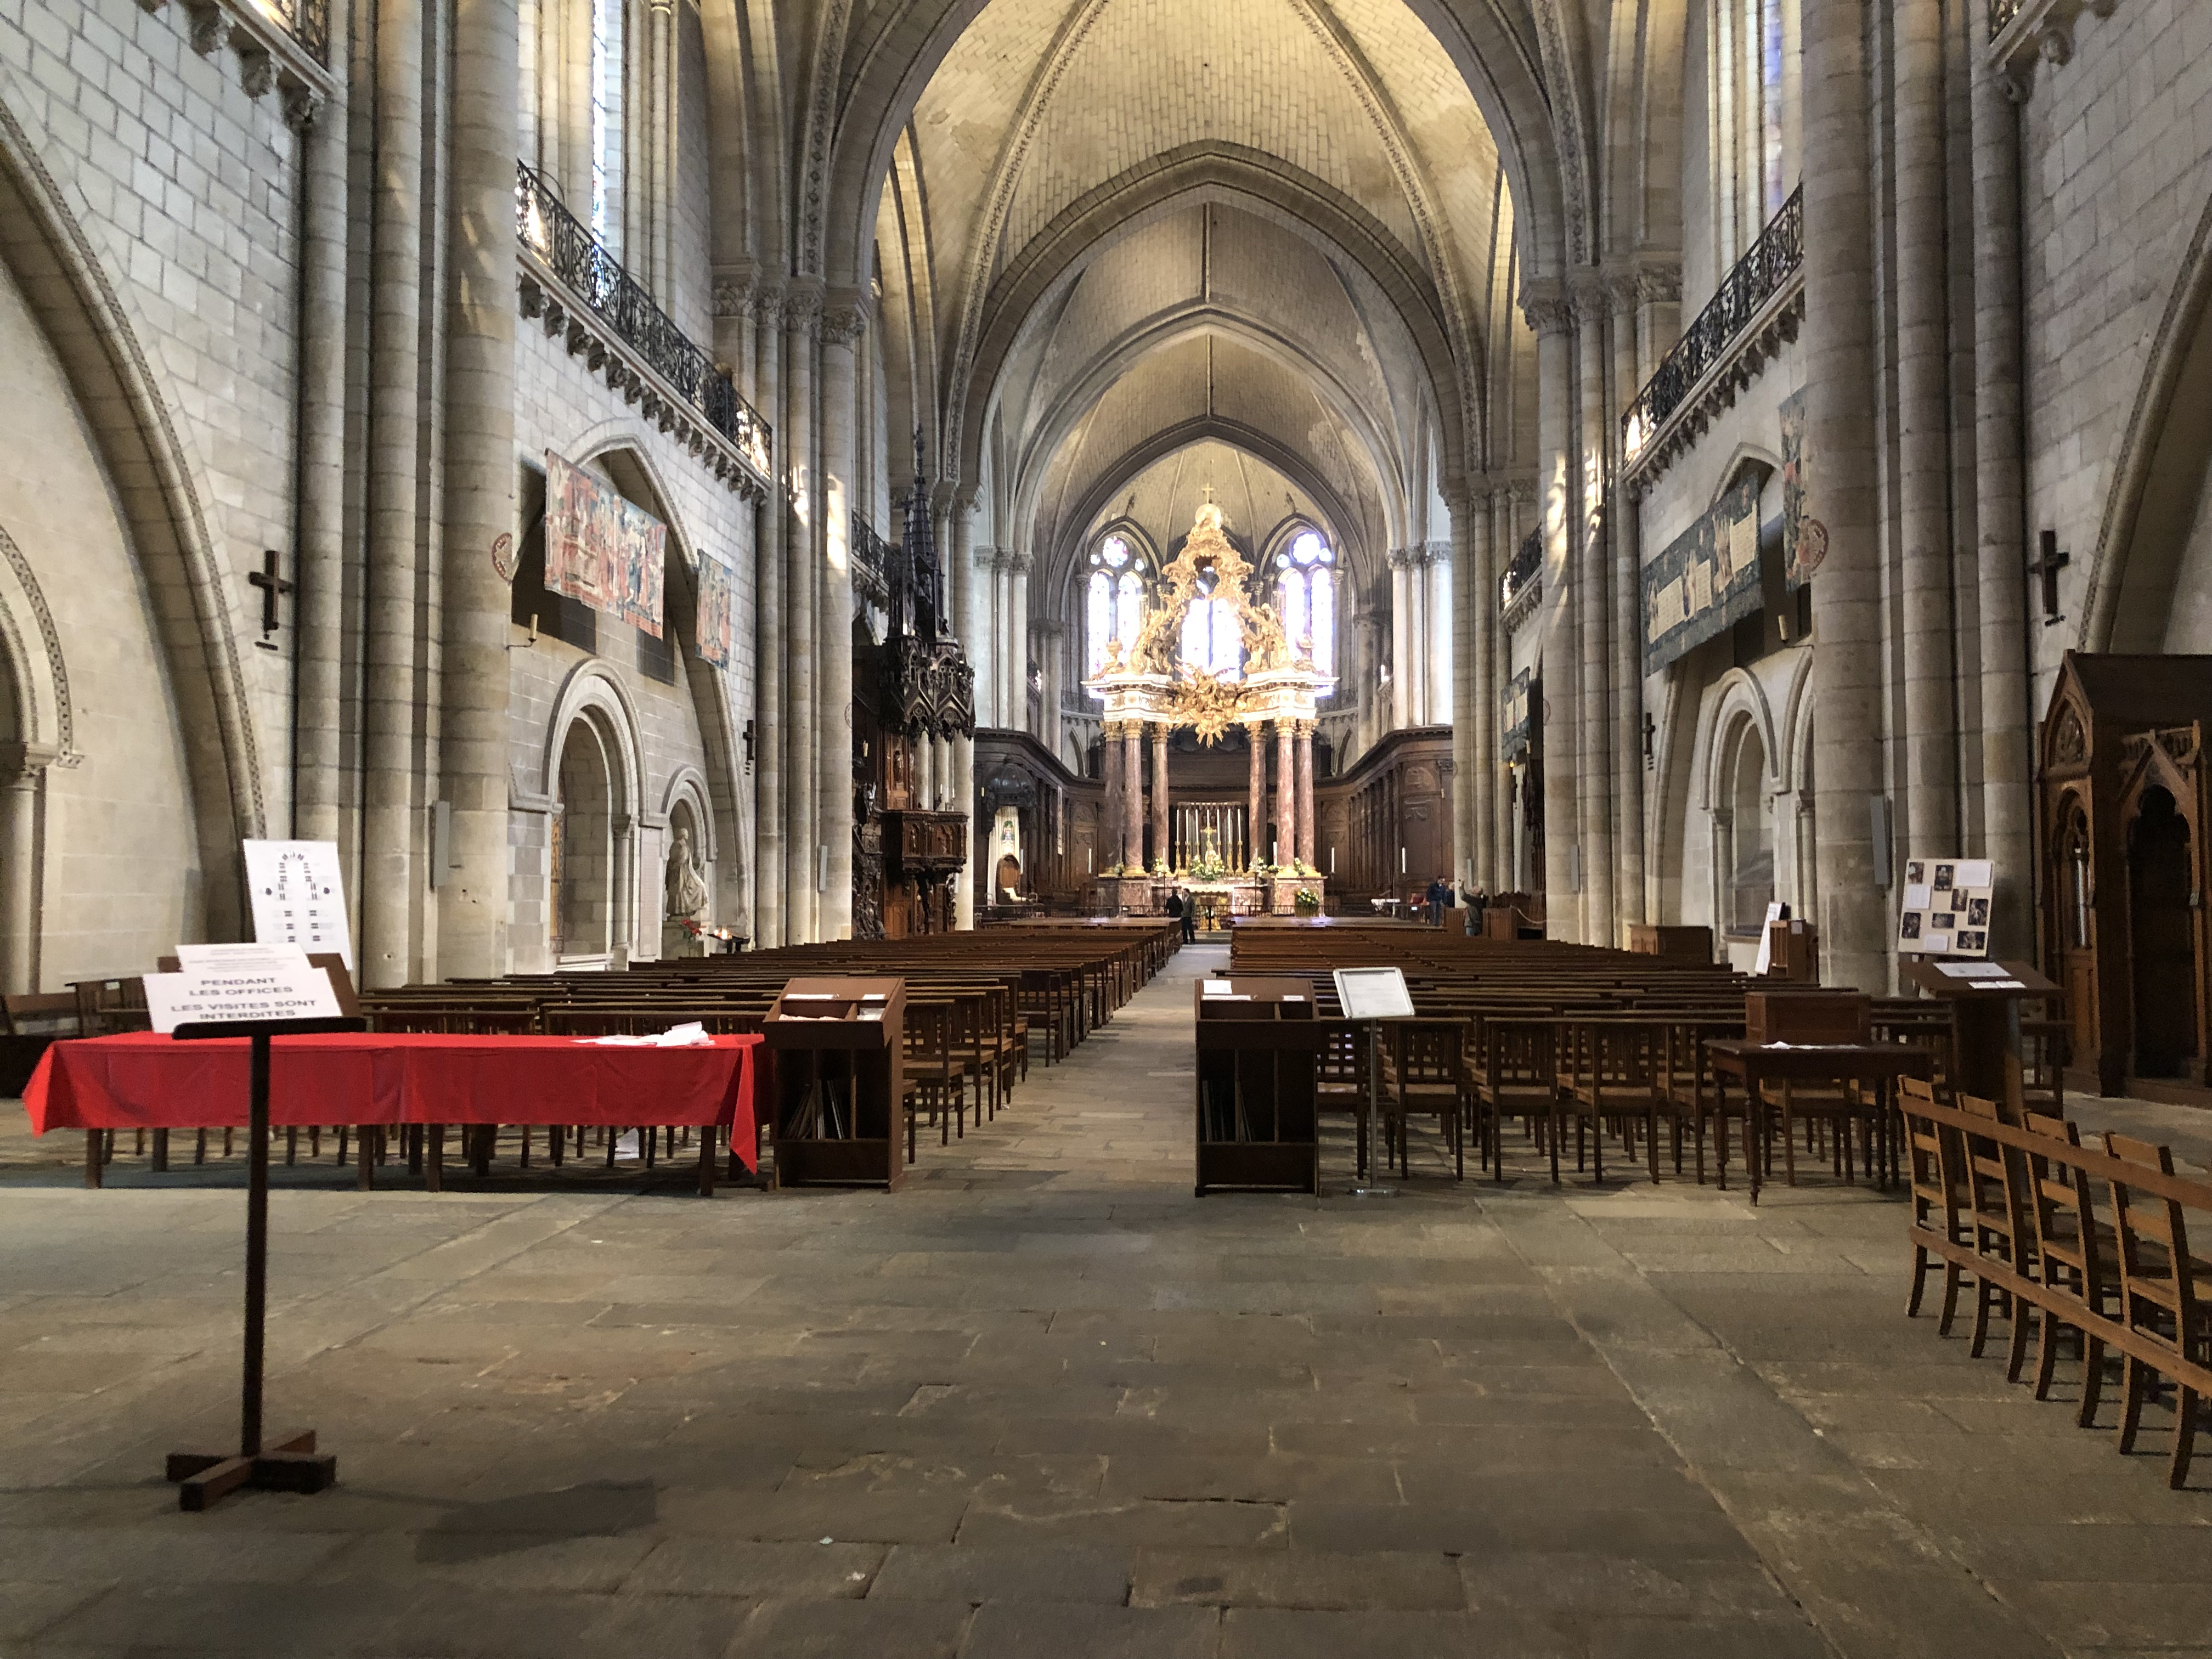 nef cathédrale d'angers